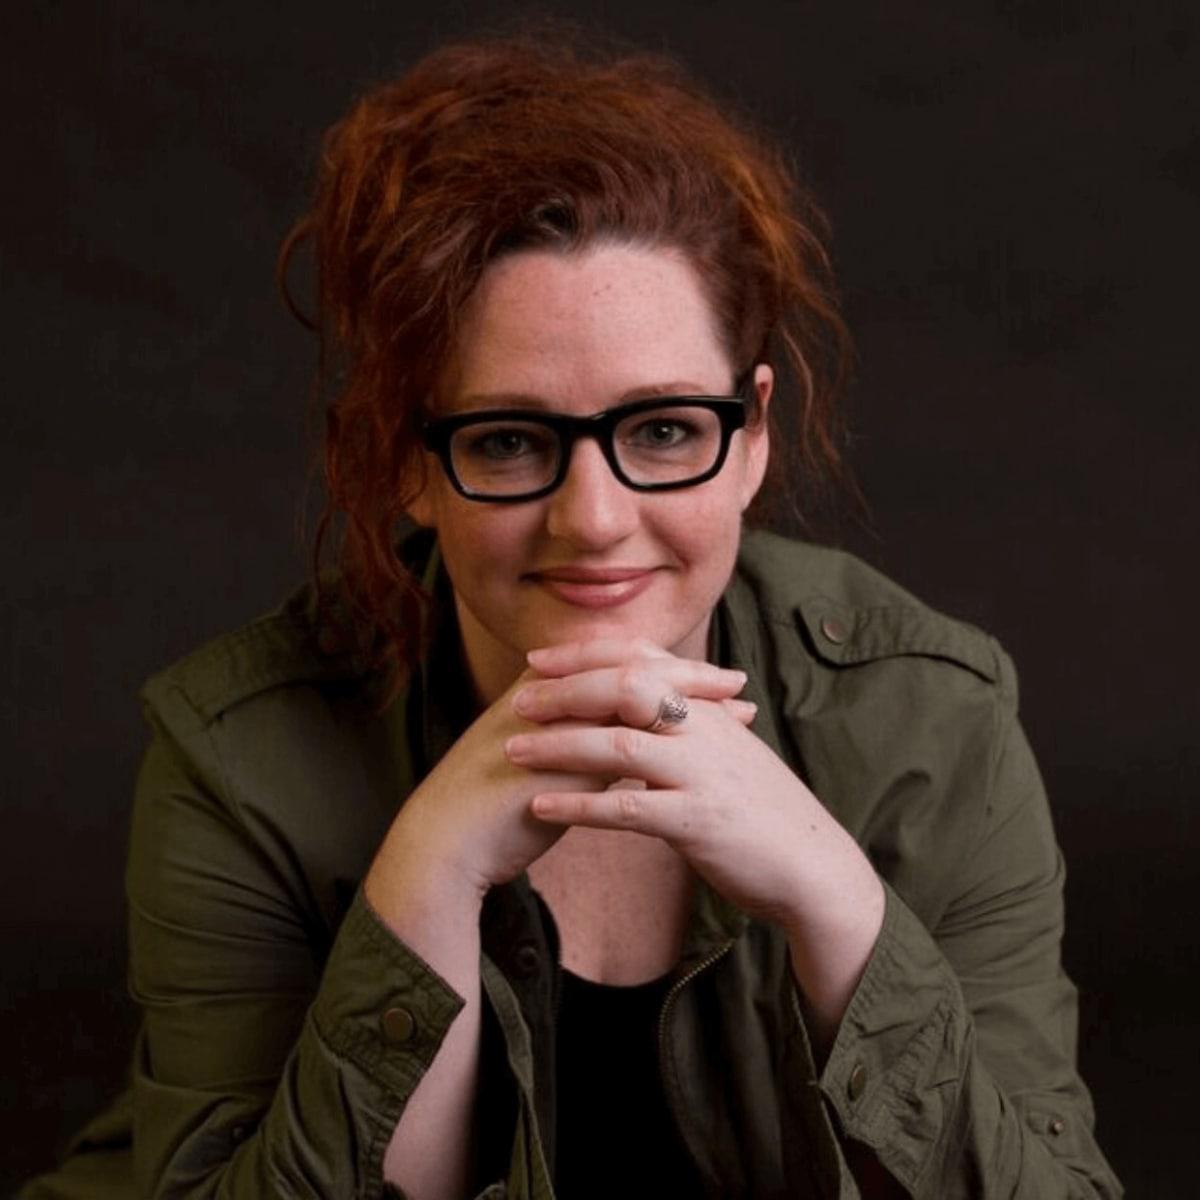 Dallas actress Jessica Cavanagh